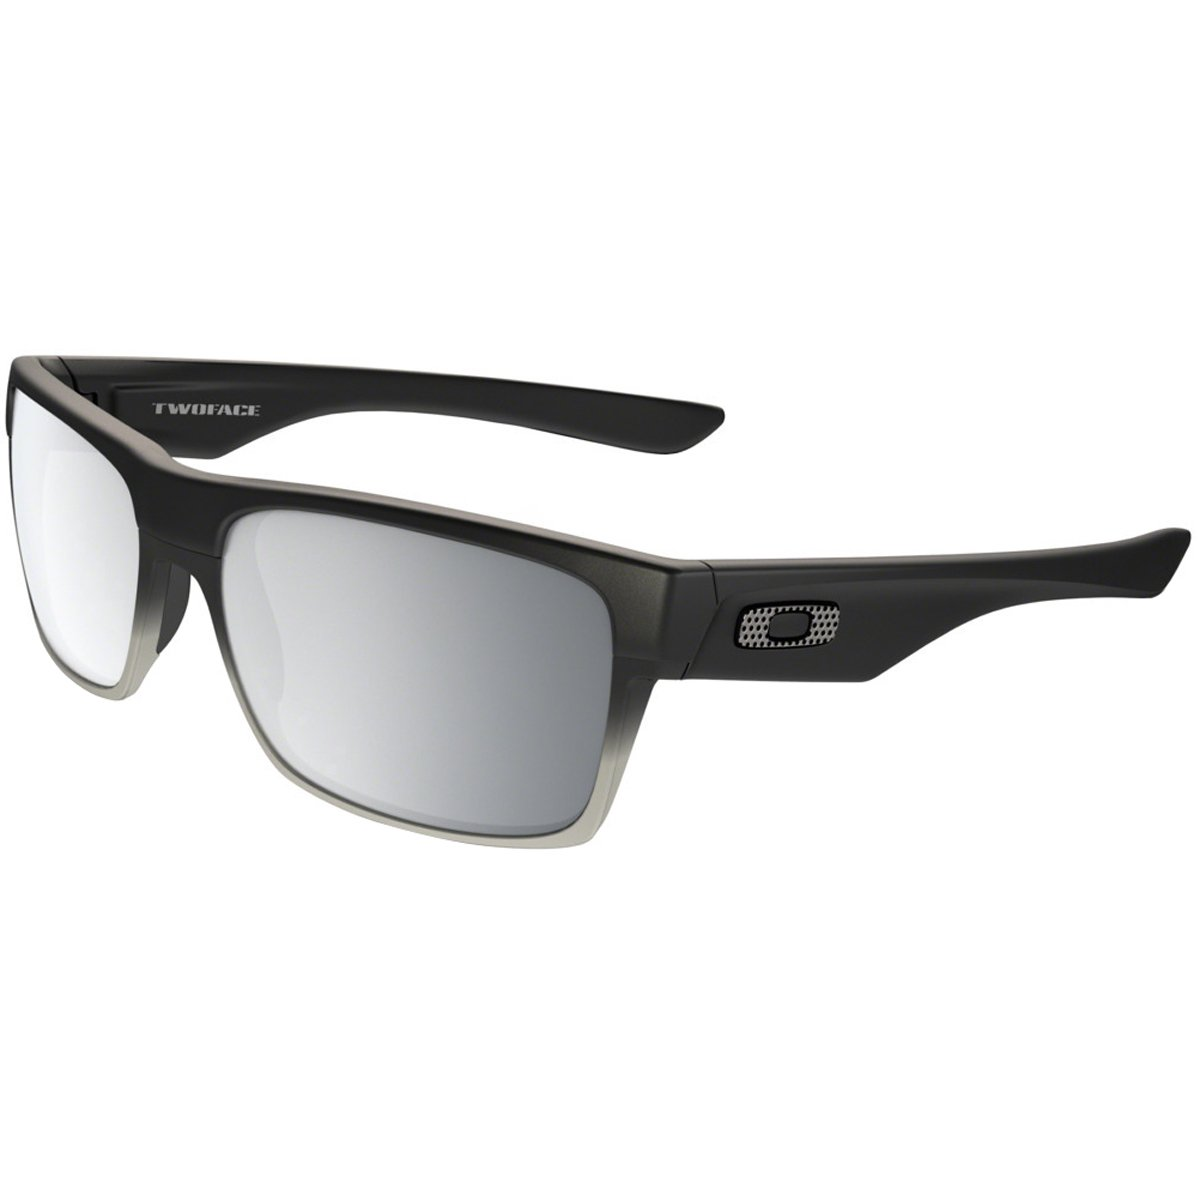 Oakley Men's OO9189 TwoFace Square Sunglasses, Matte Black/Chrome Iridium, 60 mm by Oakley